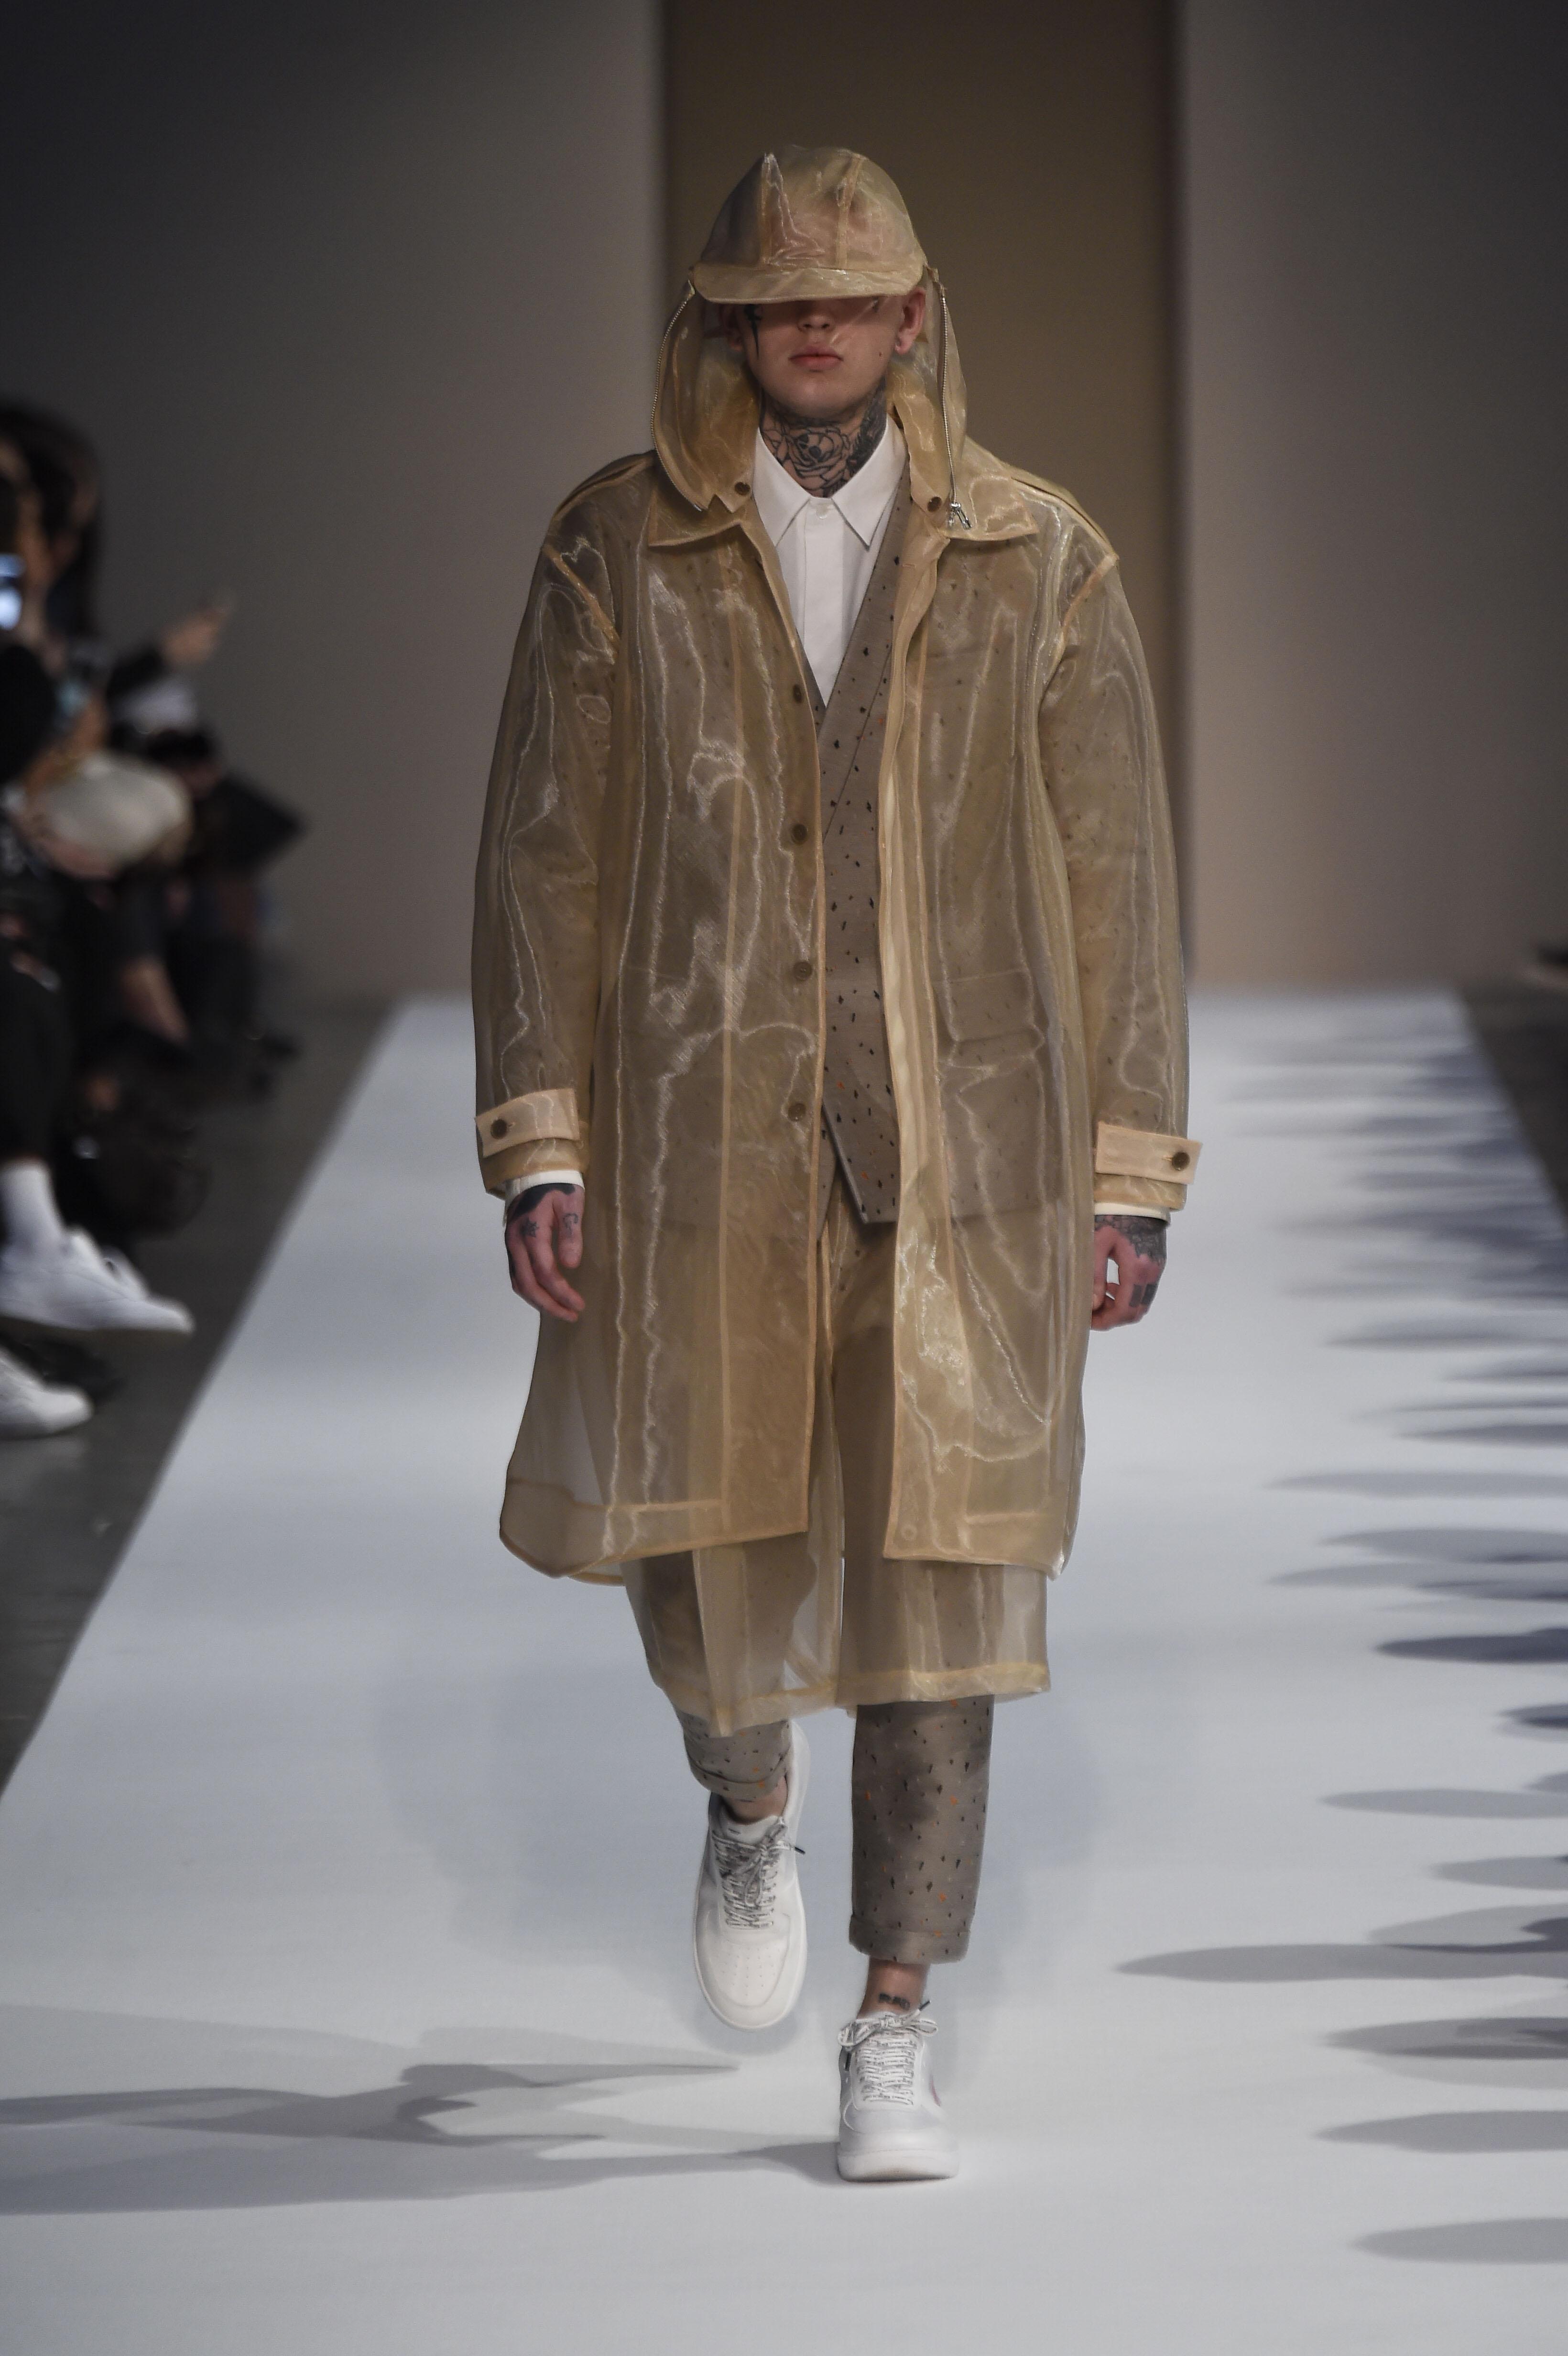 2018 Autunno Inverno 2018 19 Milano Moda Uomo - MFFashion.com ac647b8f157